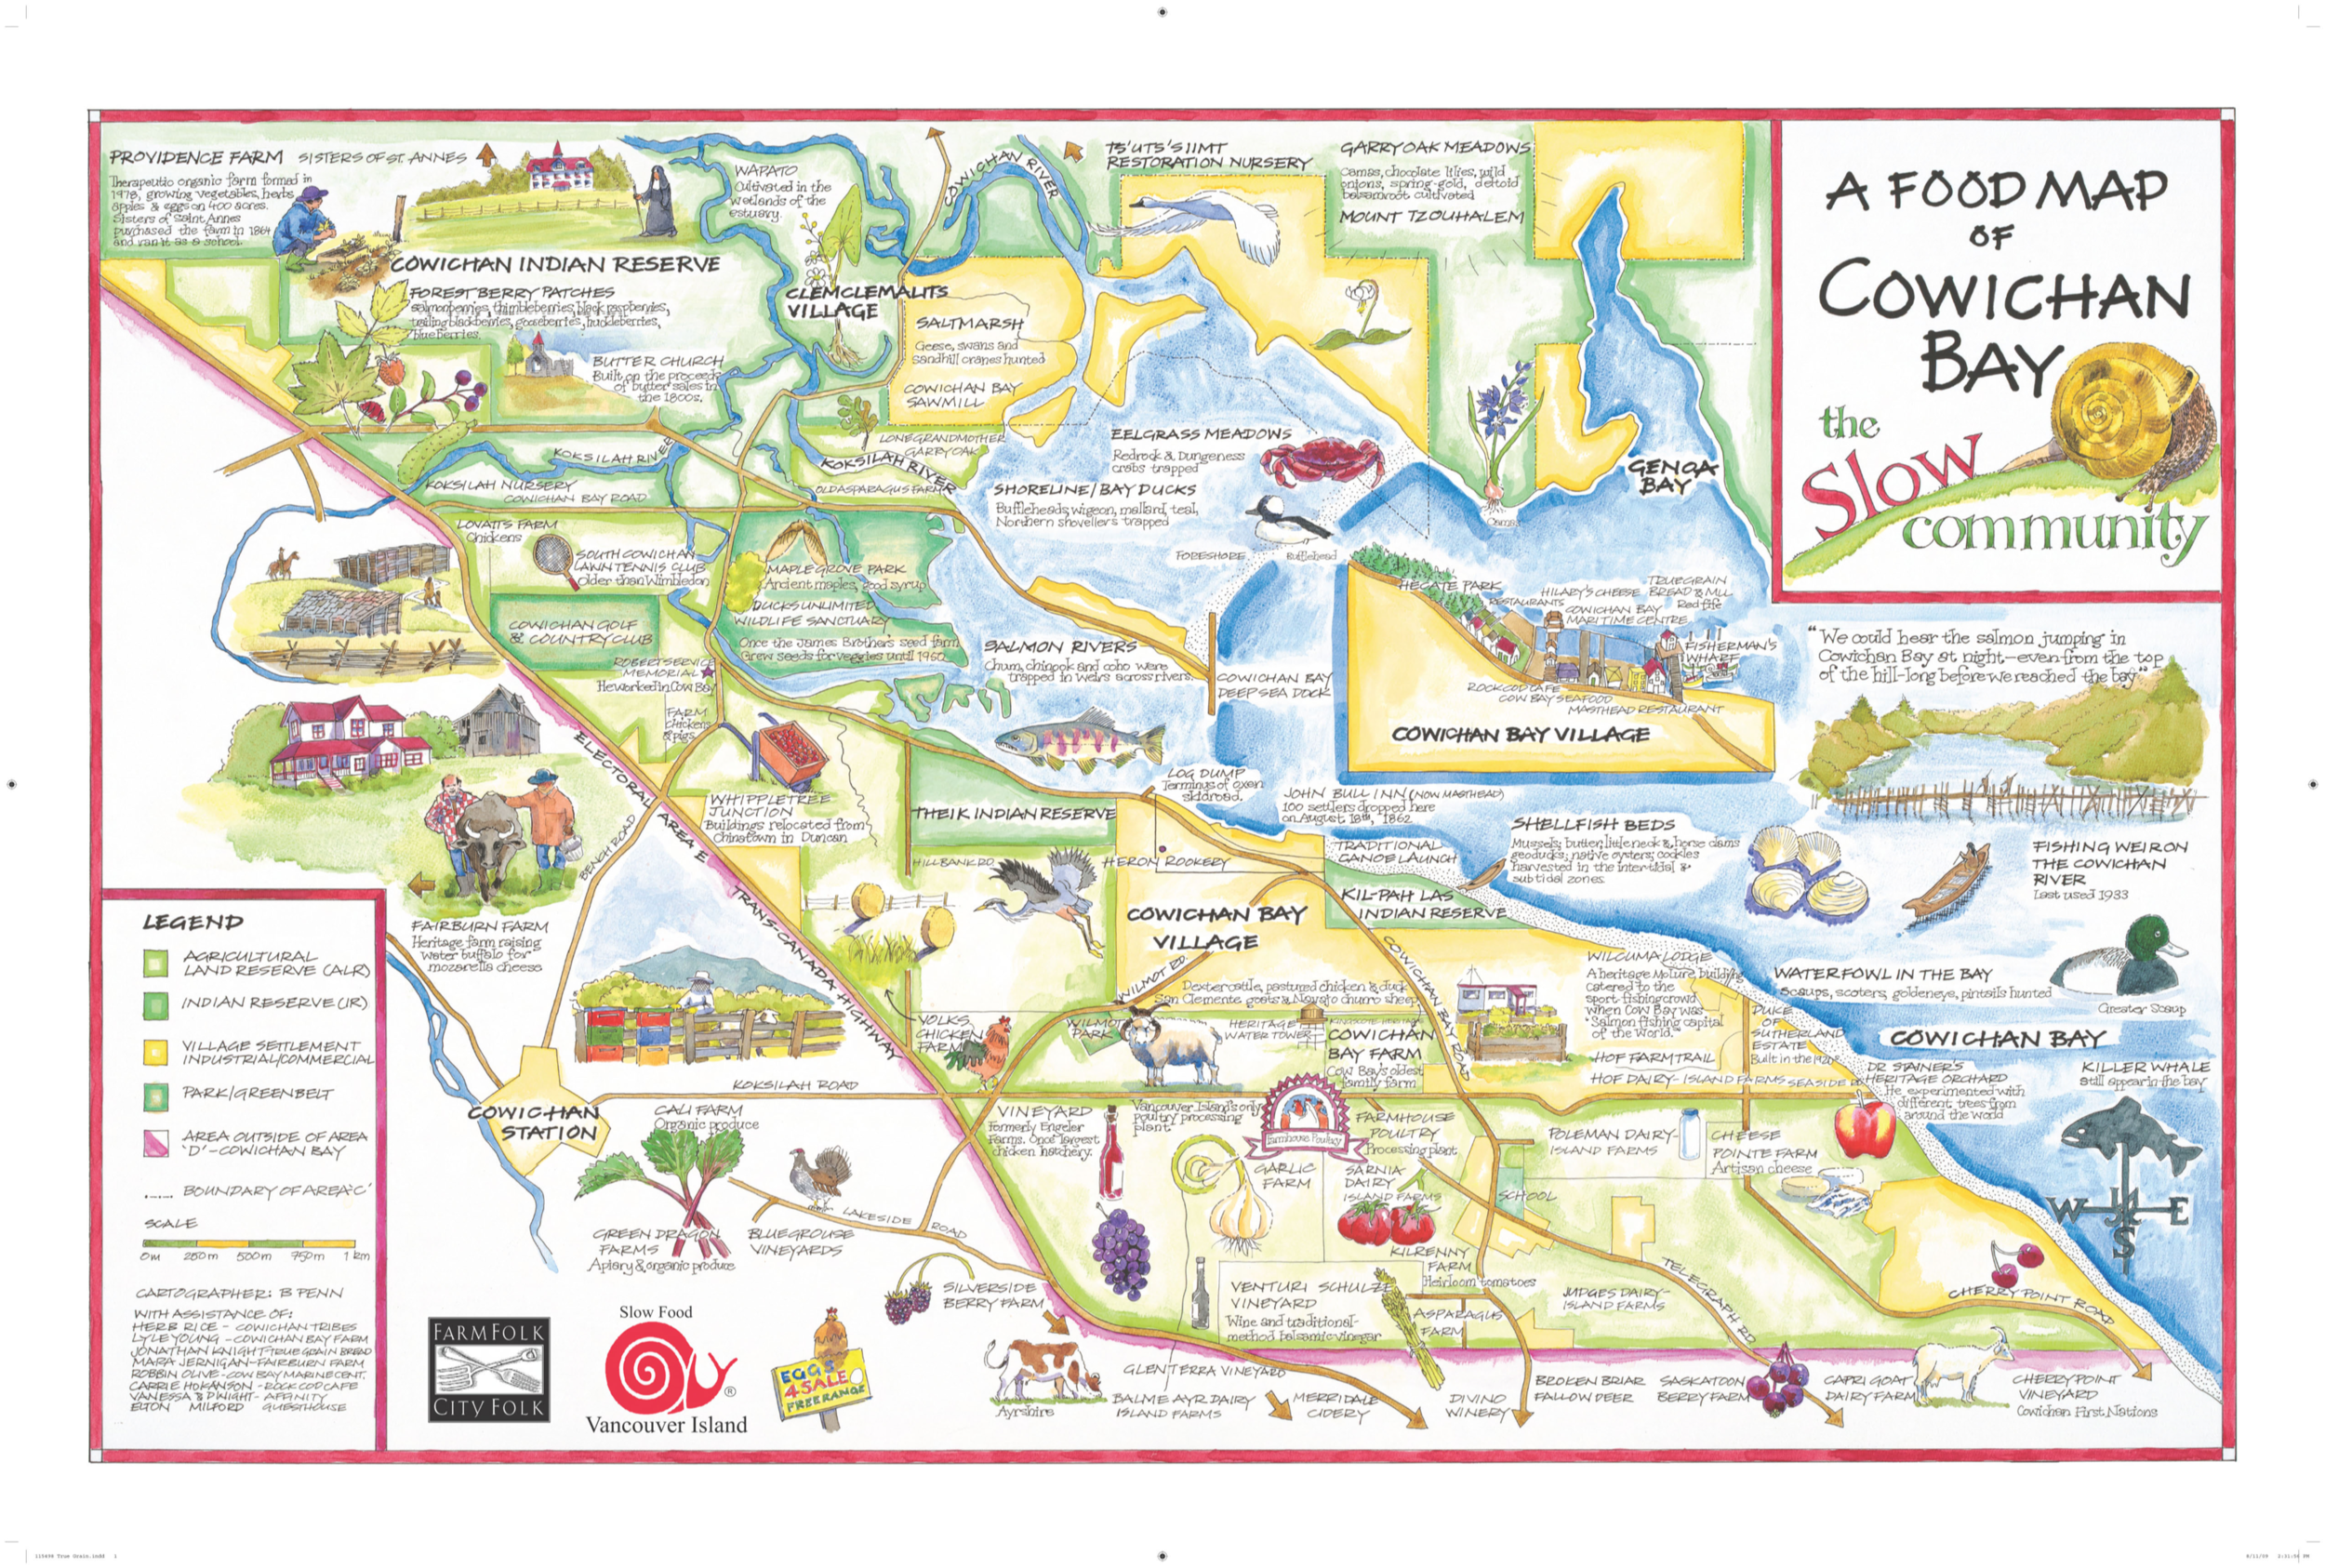 Cowichan Bay map copy.png